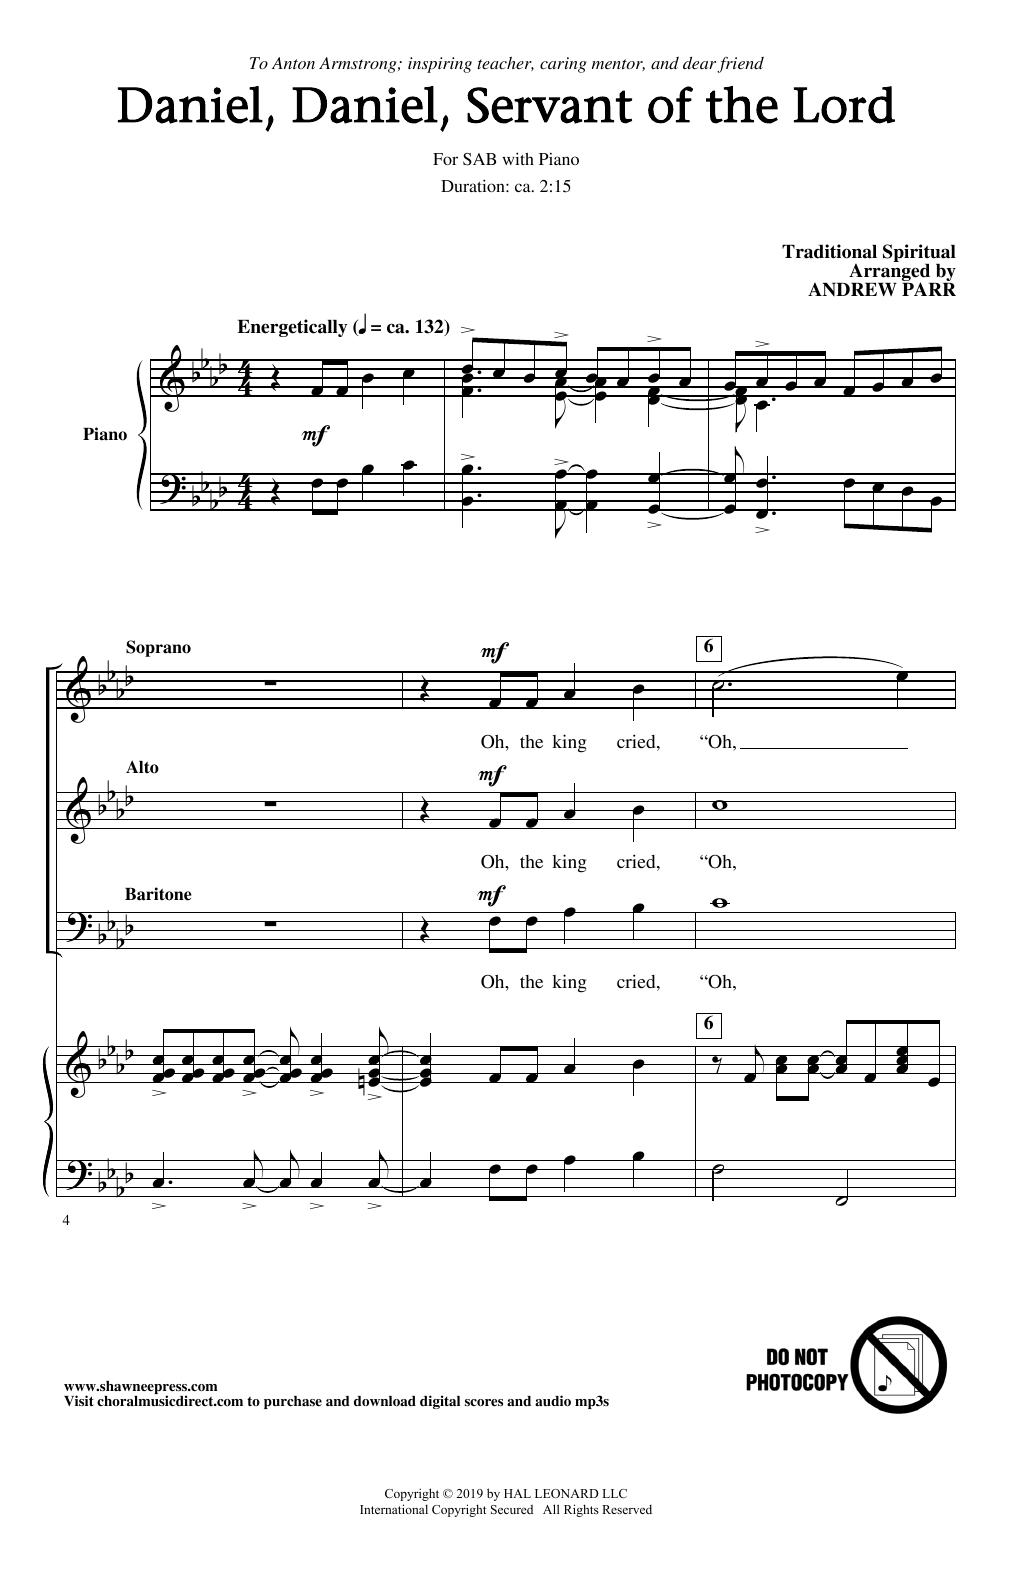 Daniel, Daniel, Servant Of The Lord (arr. Andrew Parr) (SAB Choir)